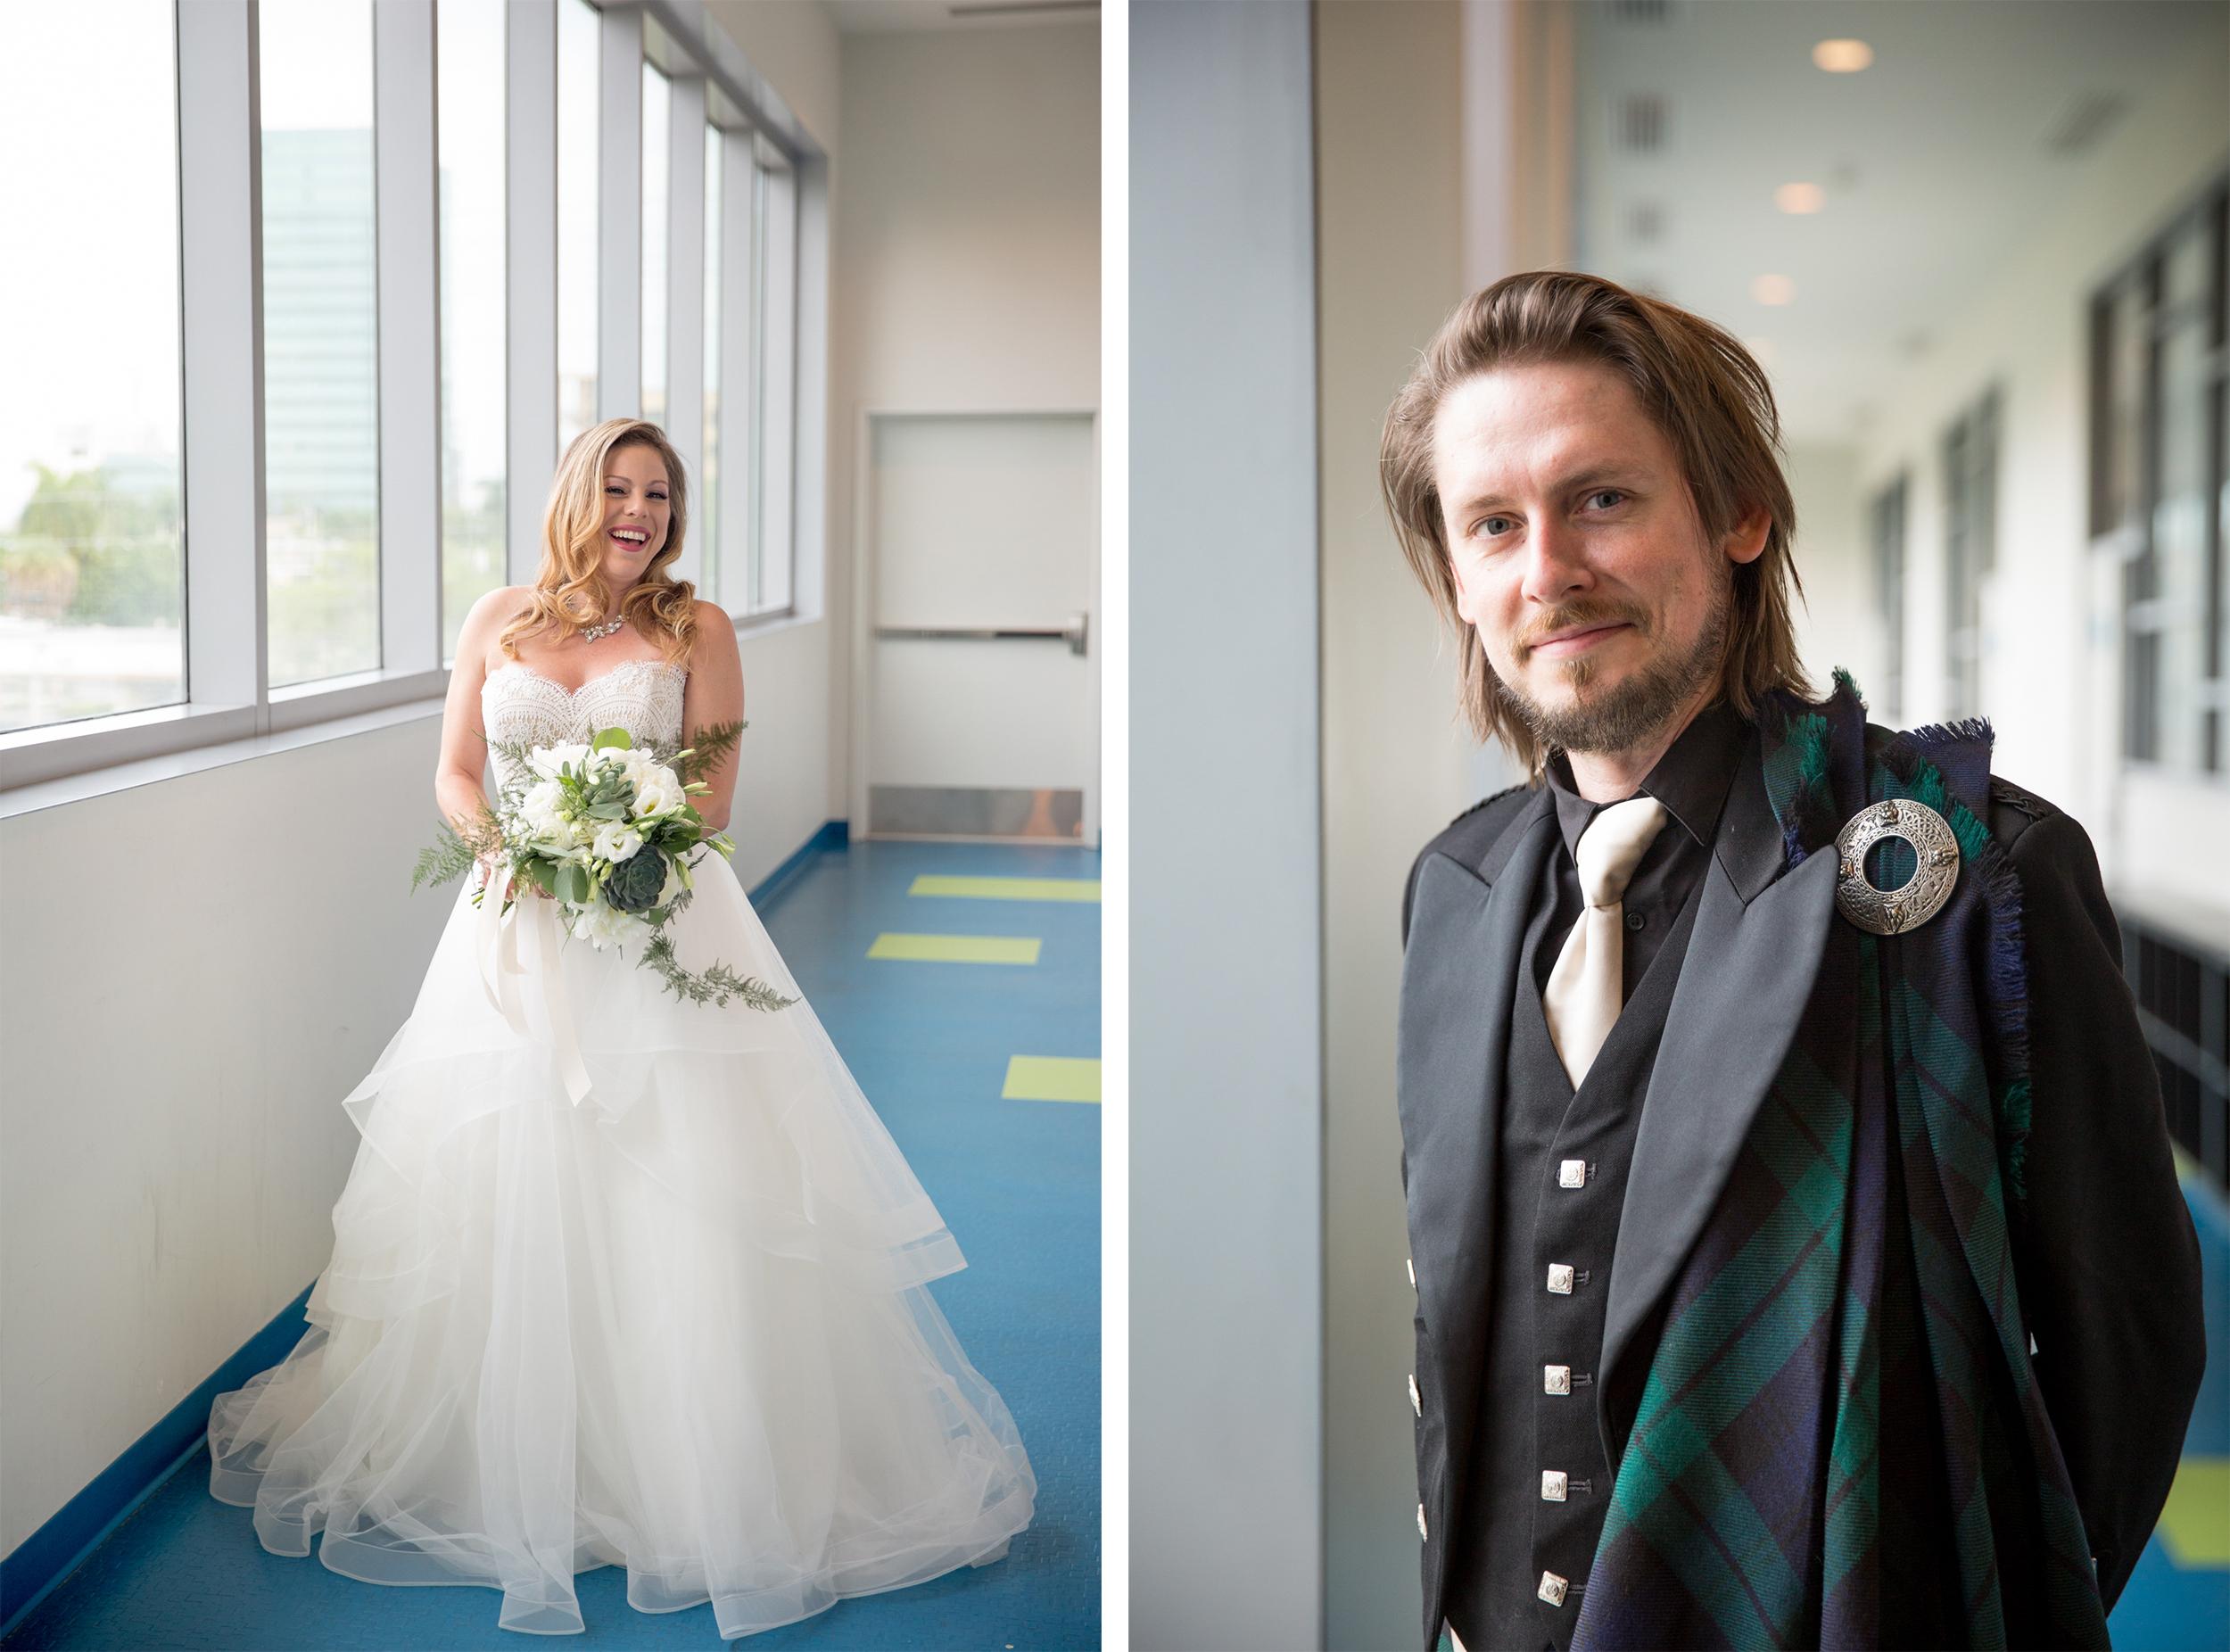 WEB_6-18-17_MindyChris_Wedding-70_30.jpg